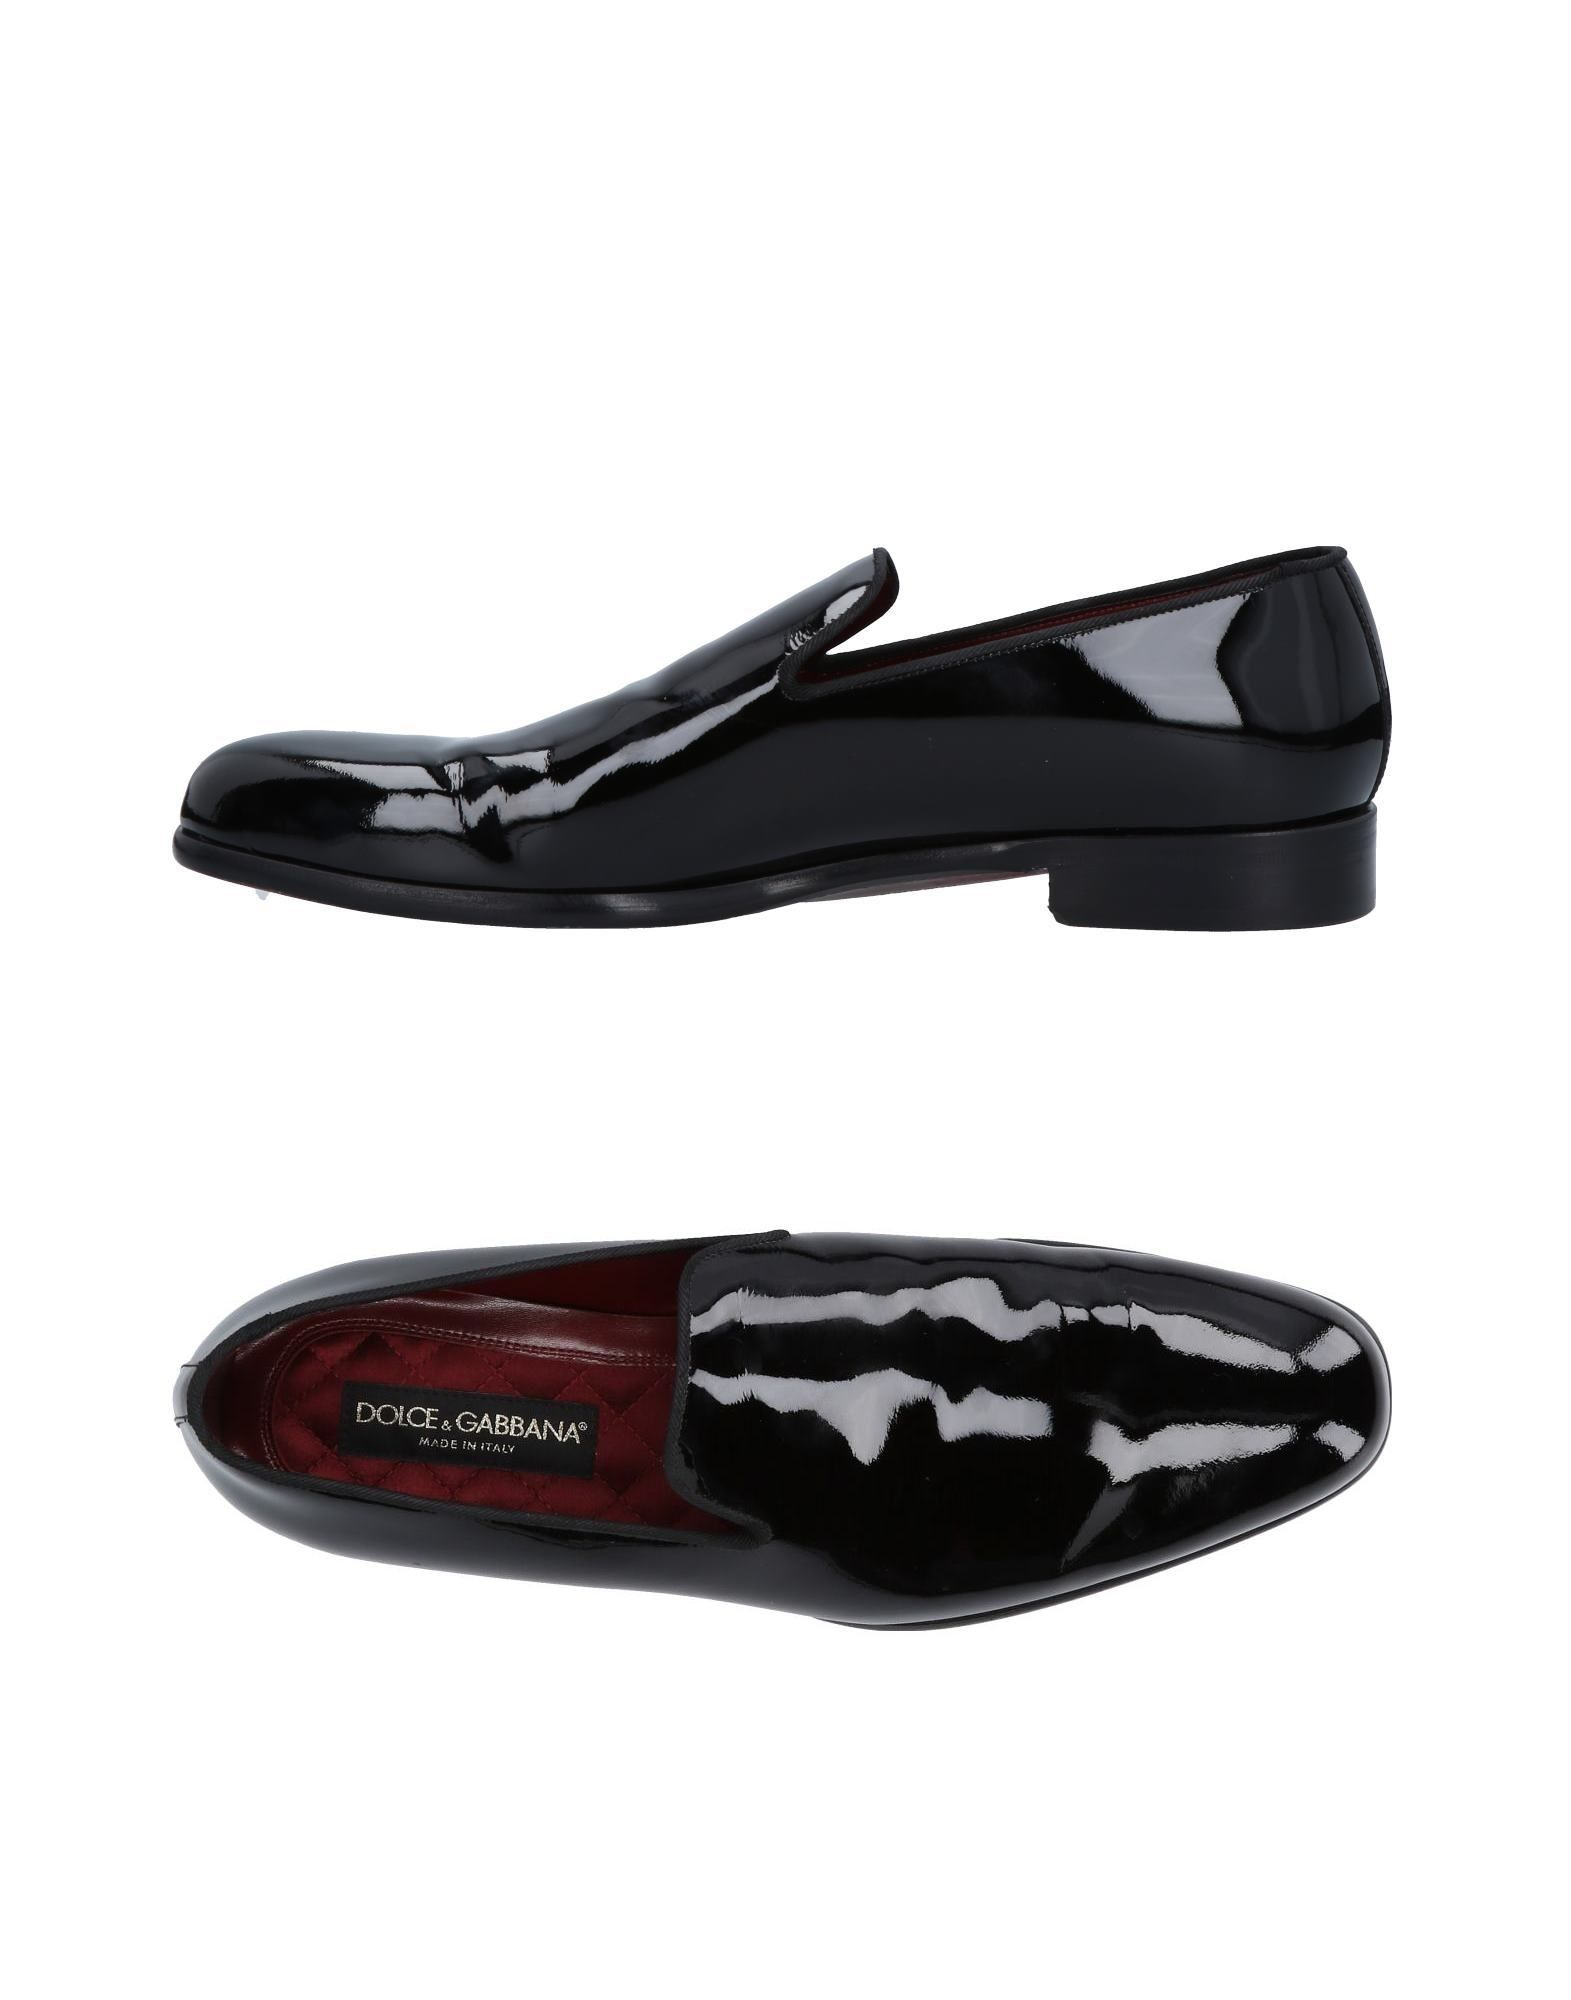 Dolce & Gabbana Mokassins Herren  11487314XQ Gute Qualität beliebte Schuhe